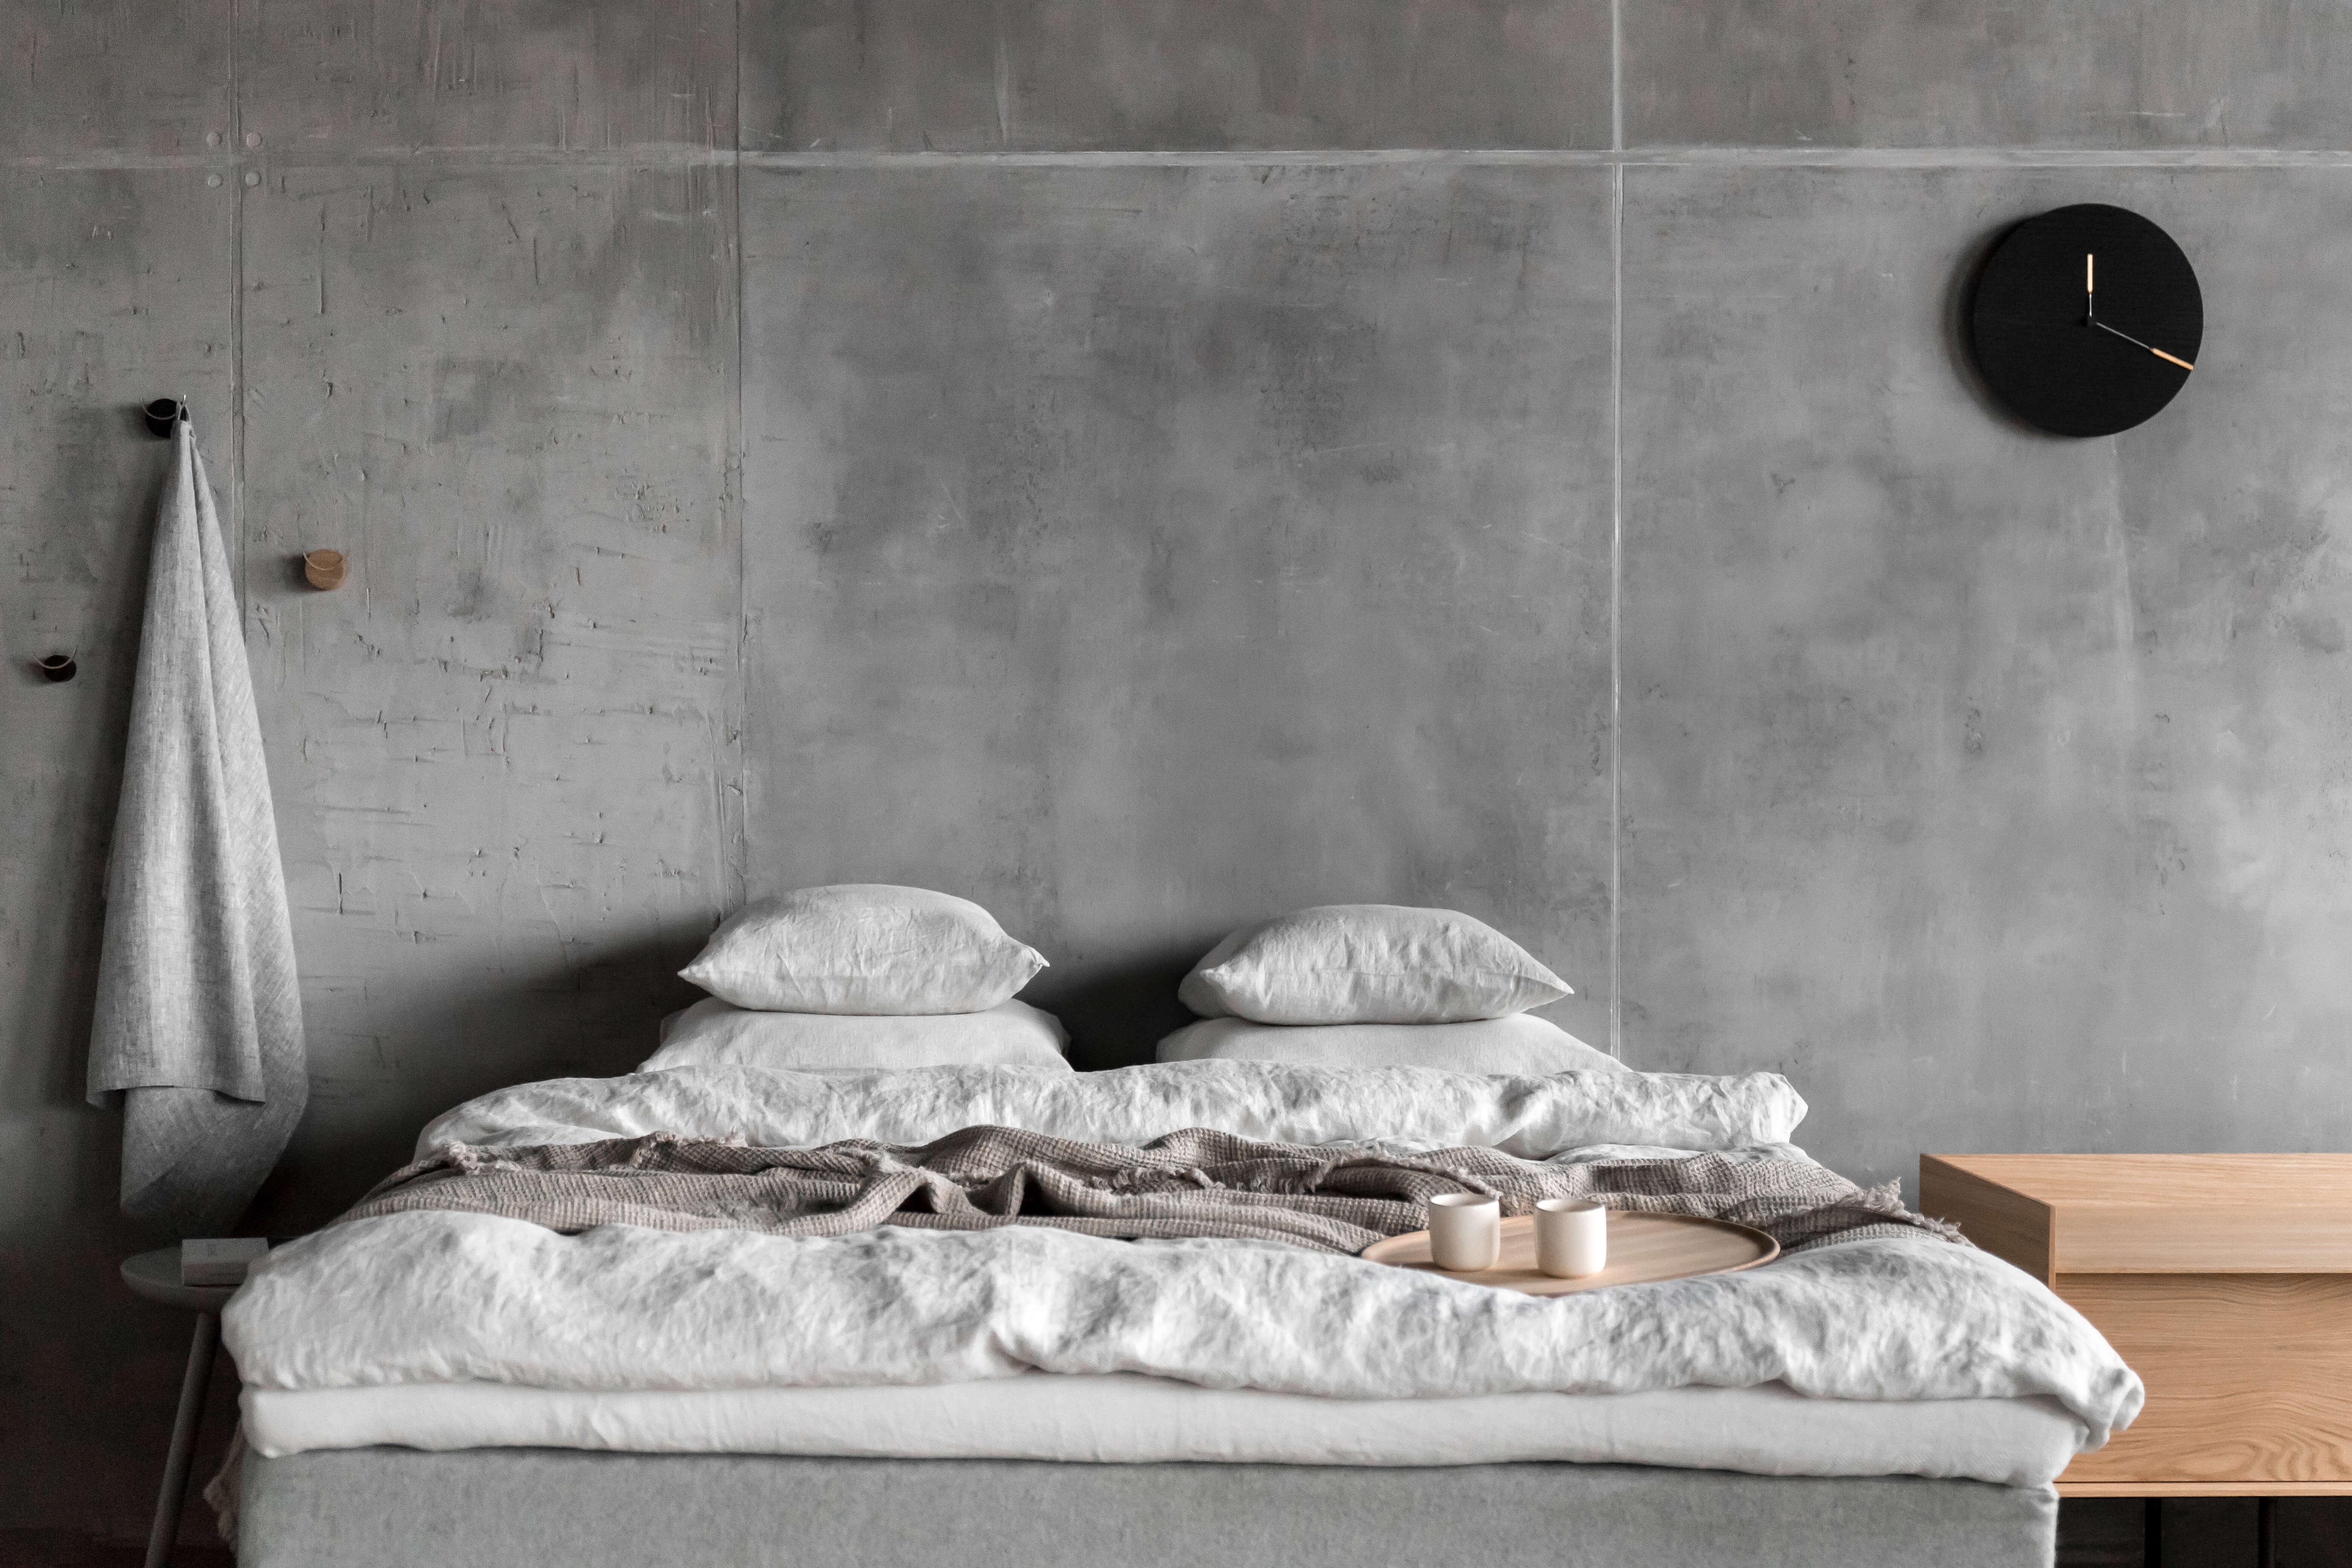 linen bedding naturally breathable